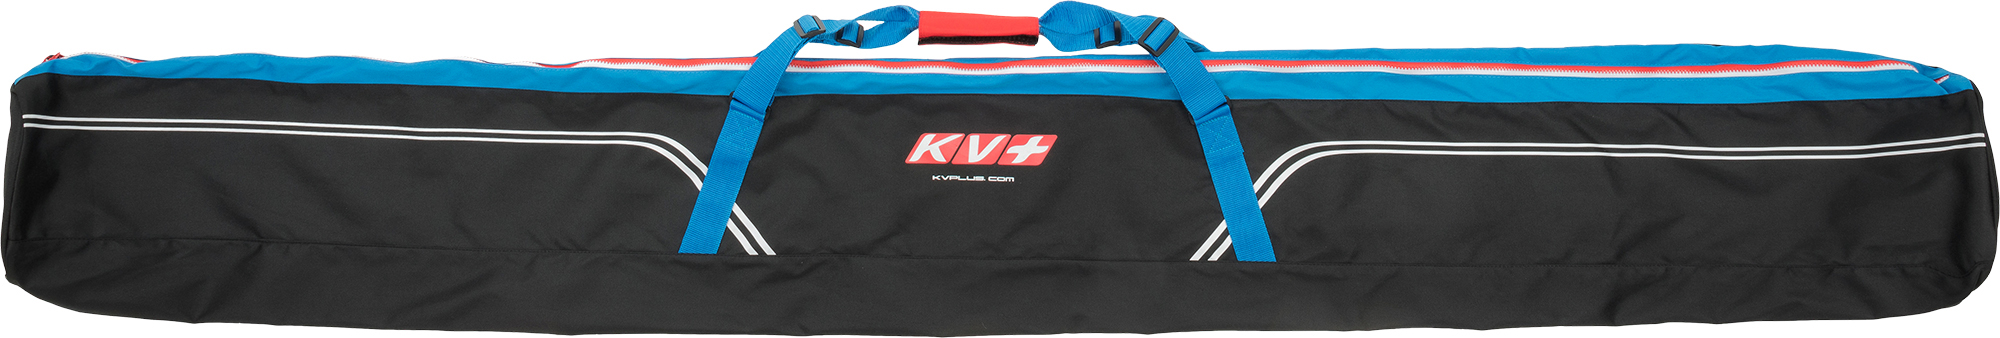 KV+ Чехол для беговых лыж